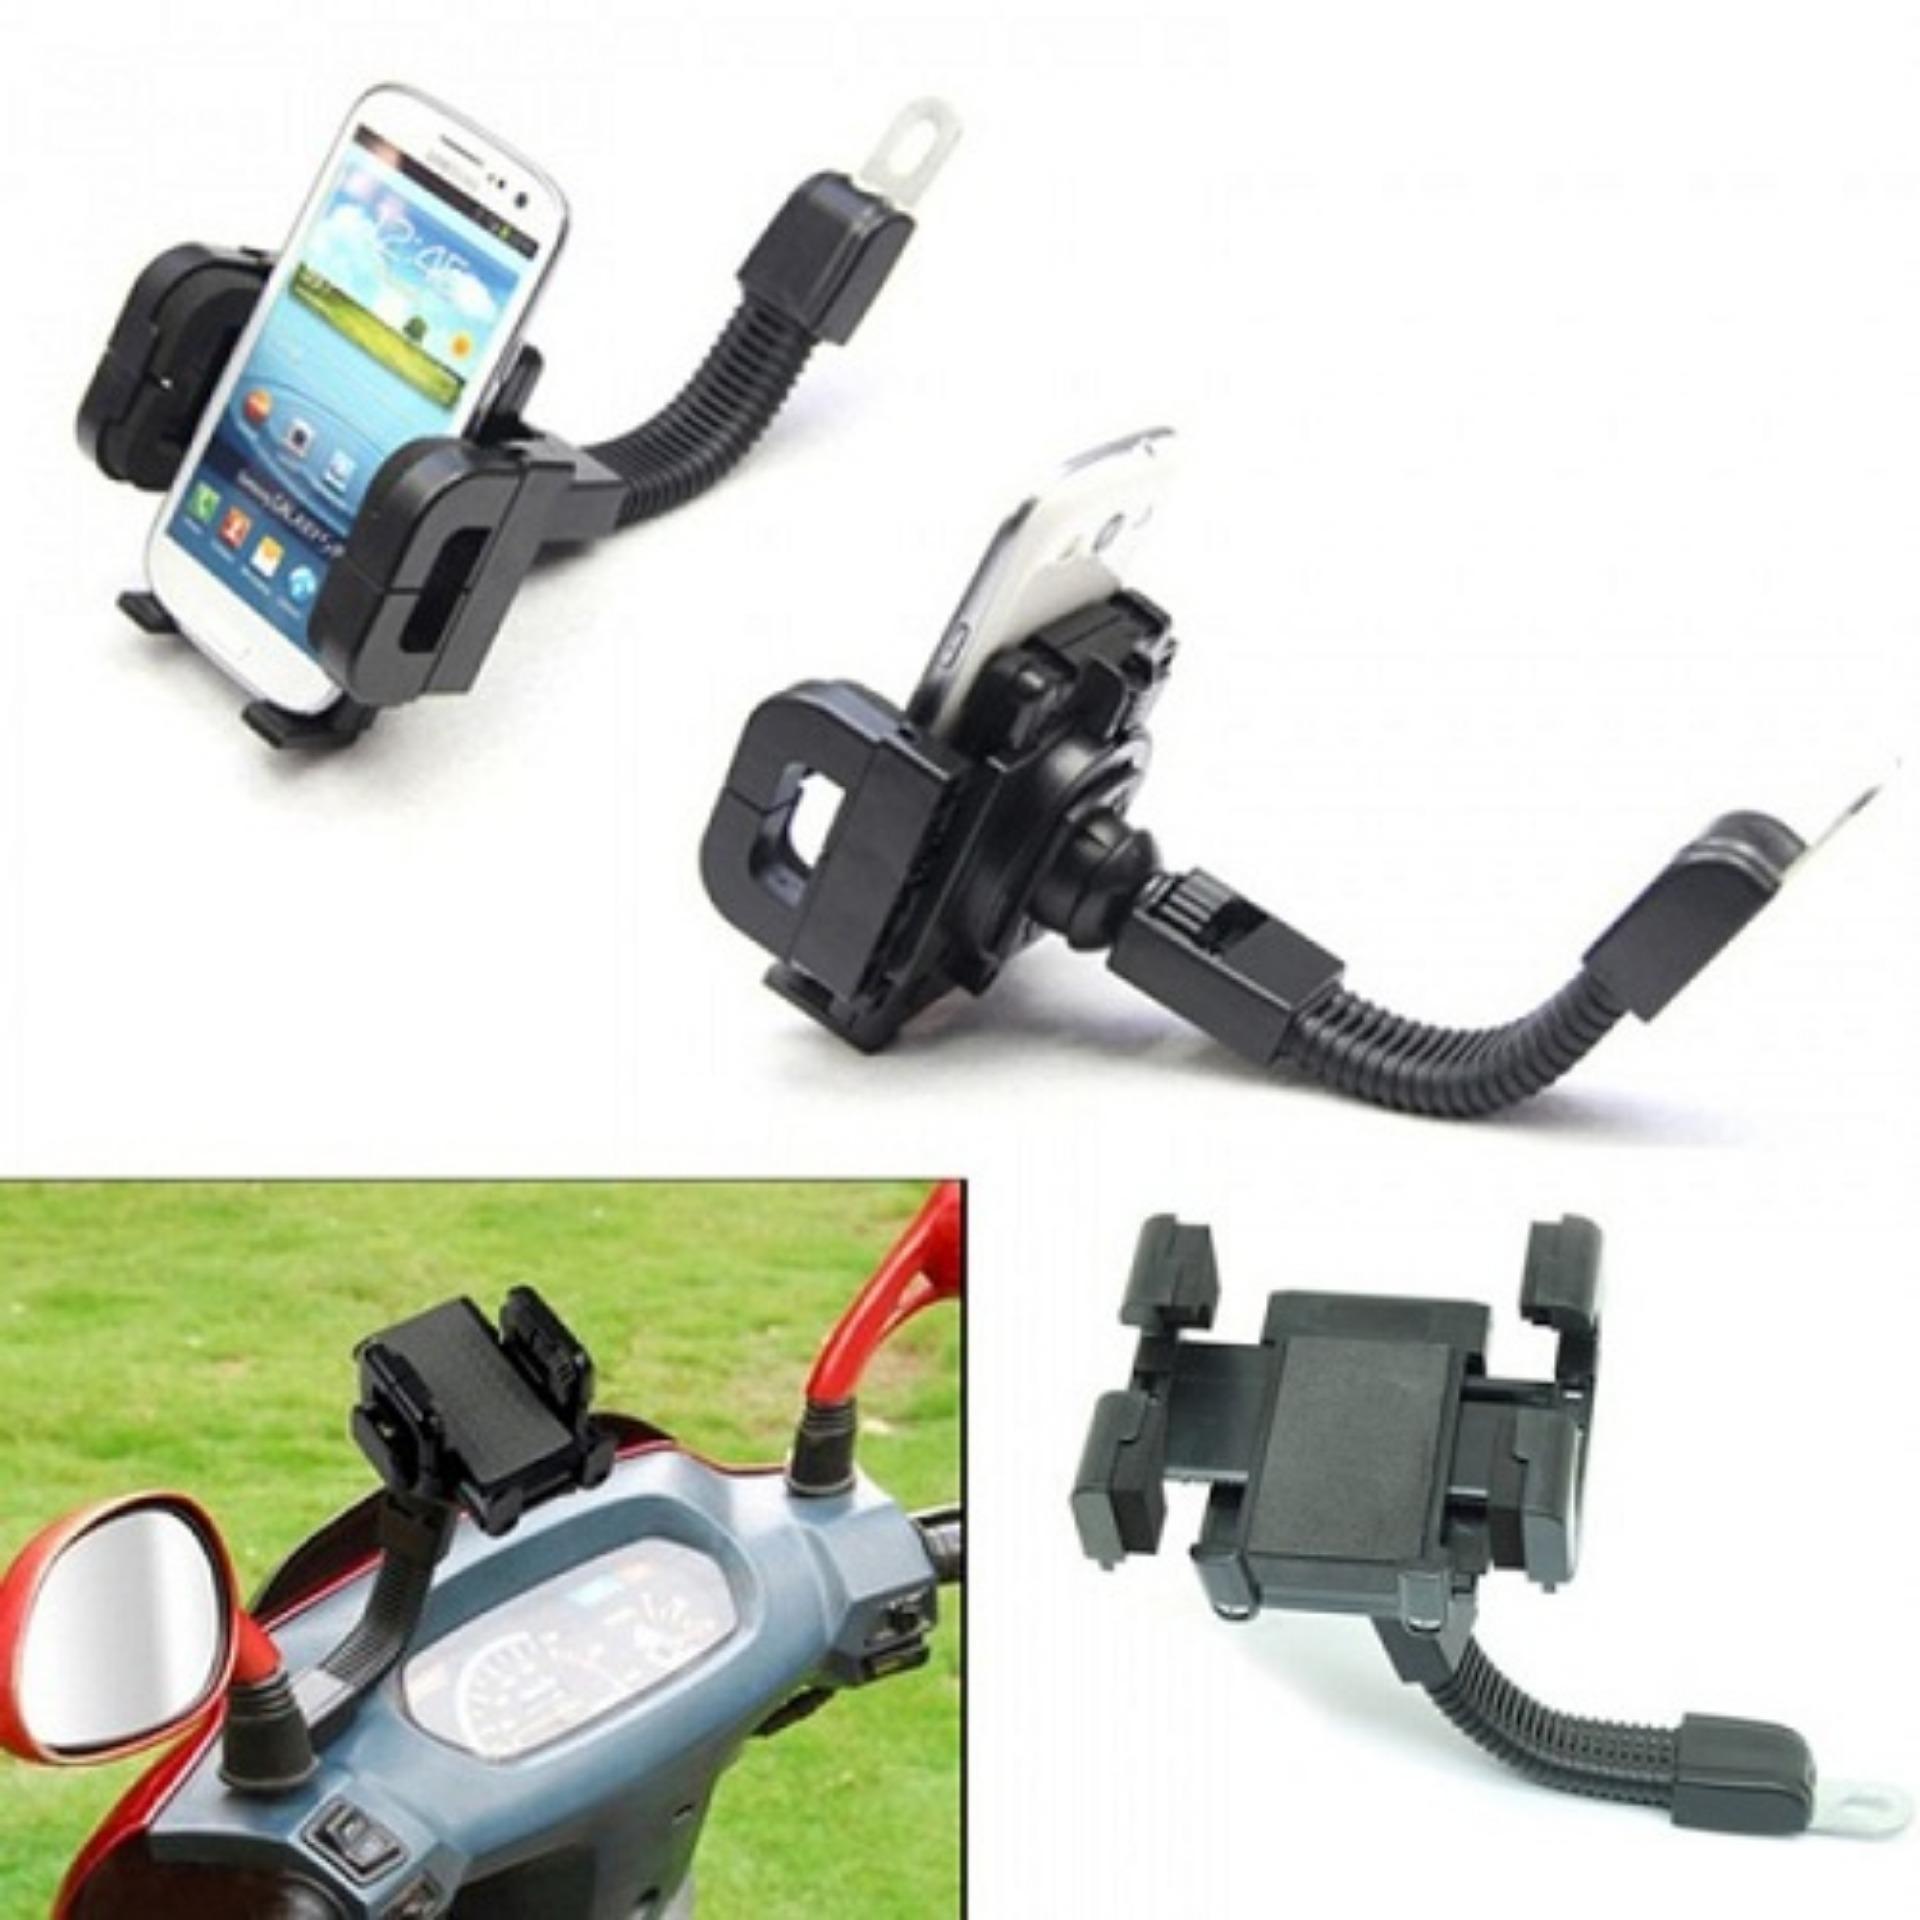 ... Holder Spion Stand Bracket Handphone dan GPS Untuk Semua Sepeda Motor Black